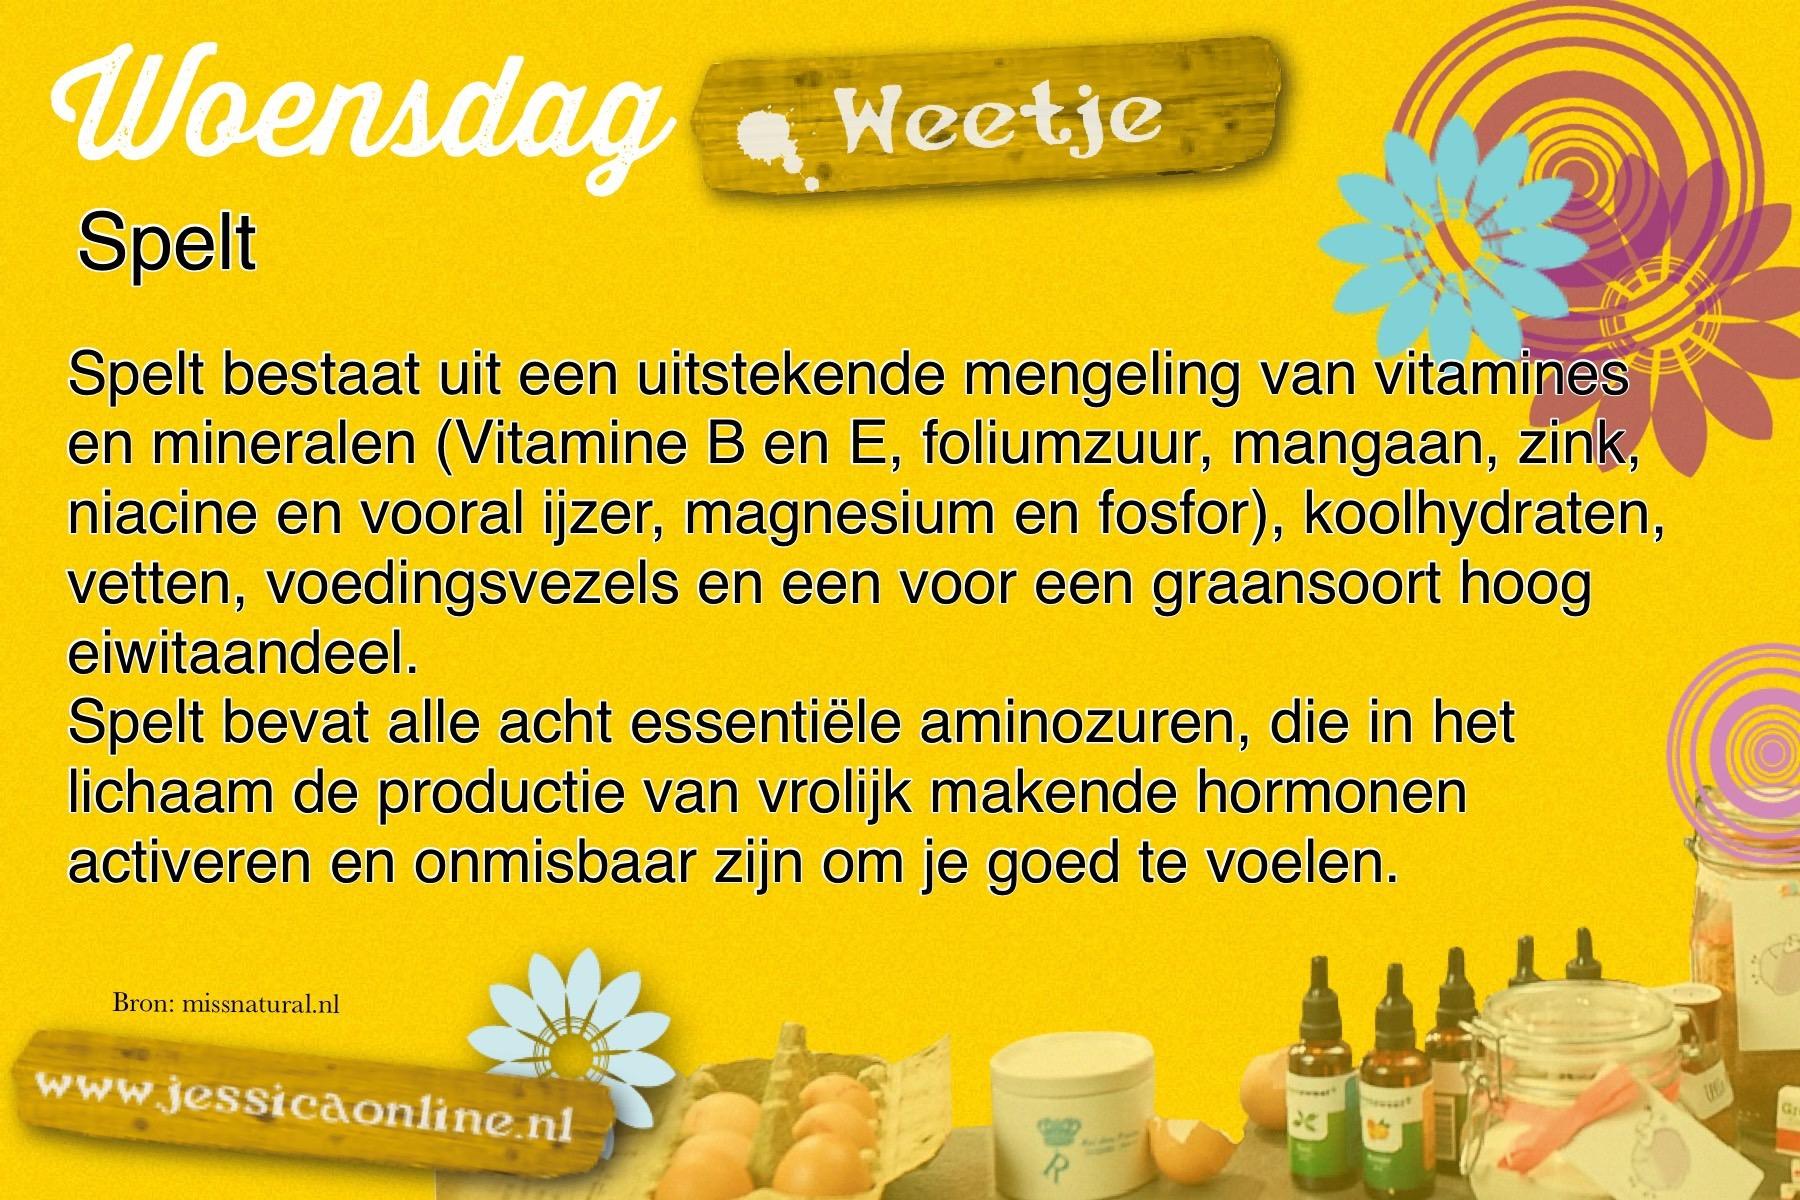 JessicaOnline.nl woensdag weetje 23